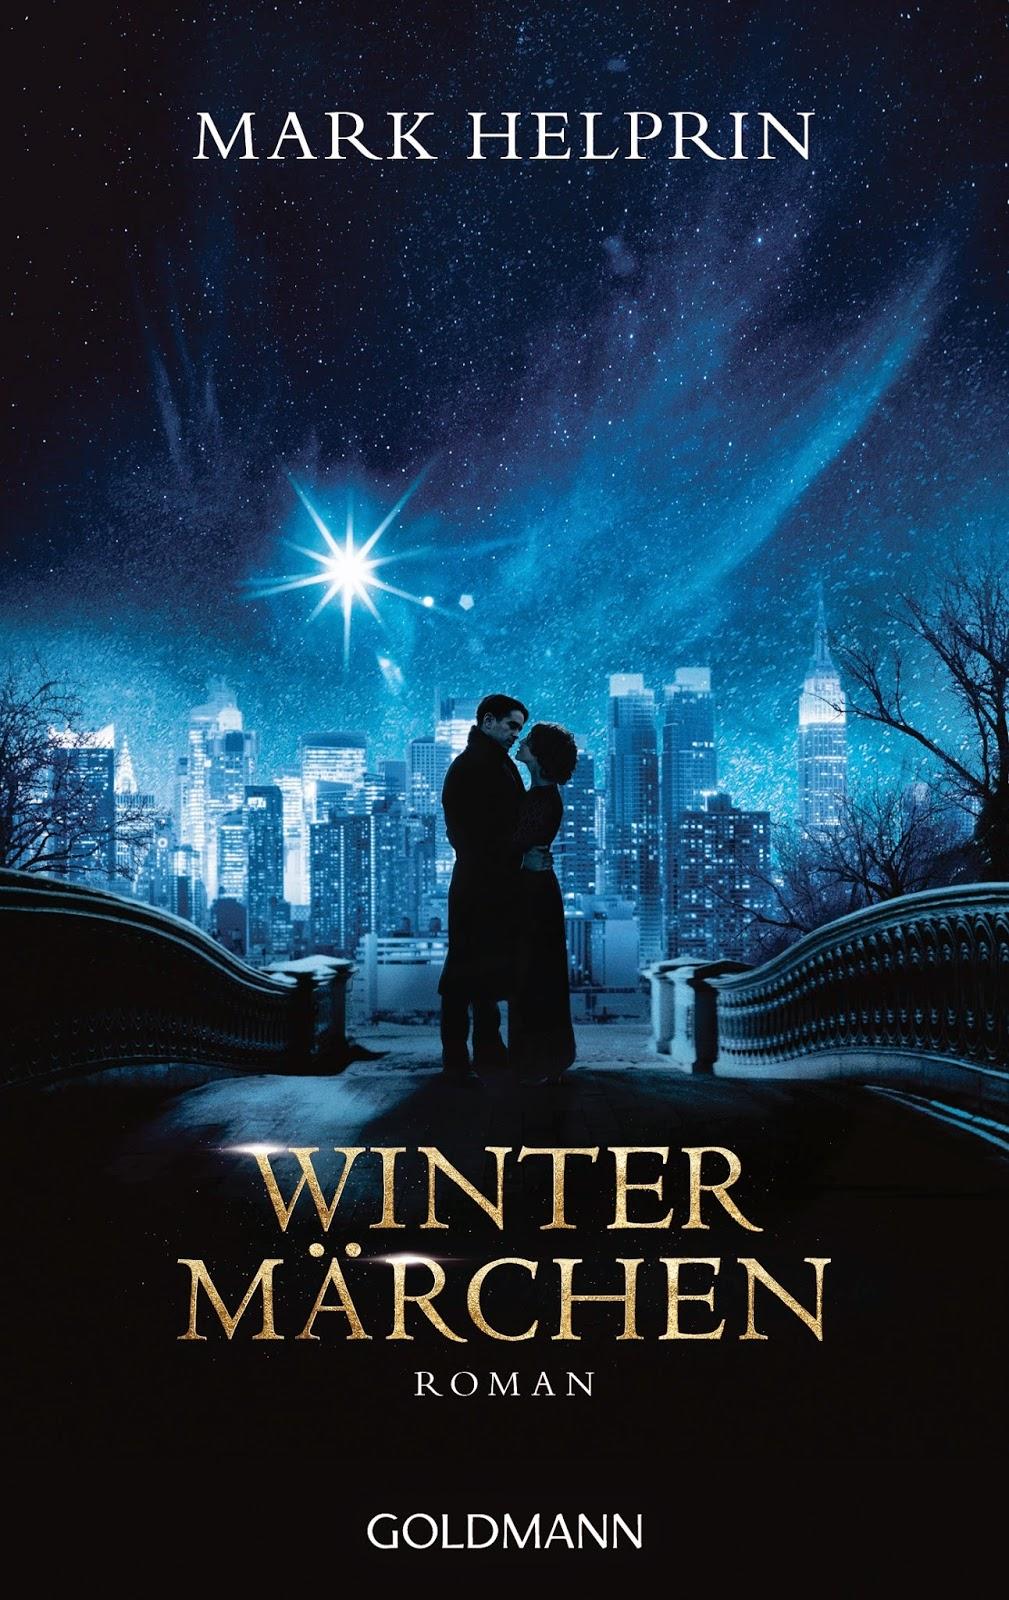 http://www.randomhouse.de/Taschenbuch/Wintermaerchen-Roman/Mark-Helprin/e451990.rhd